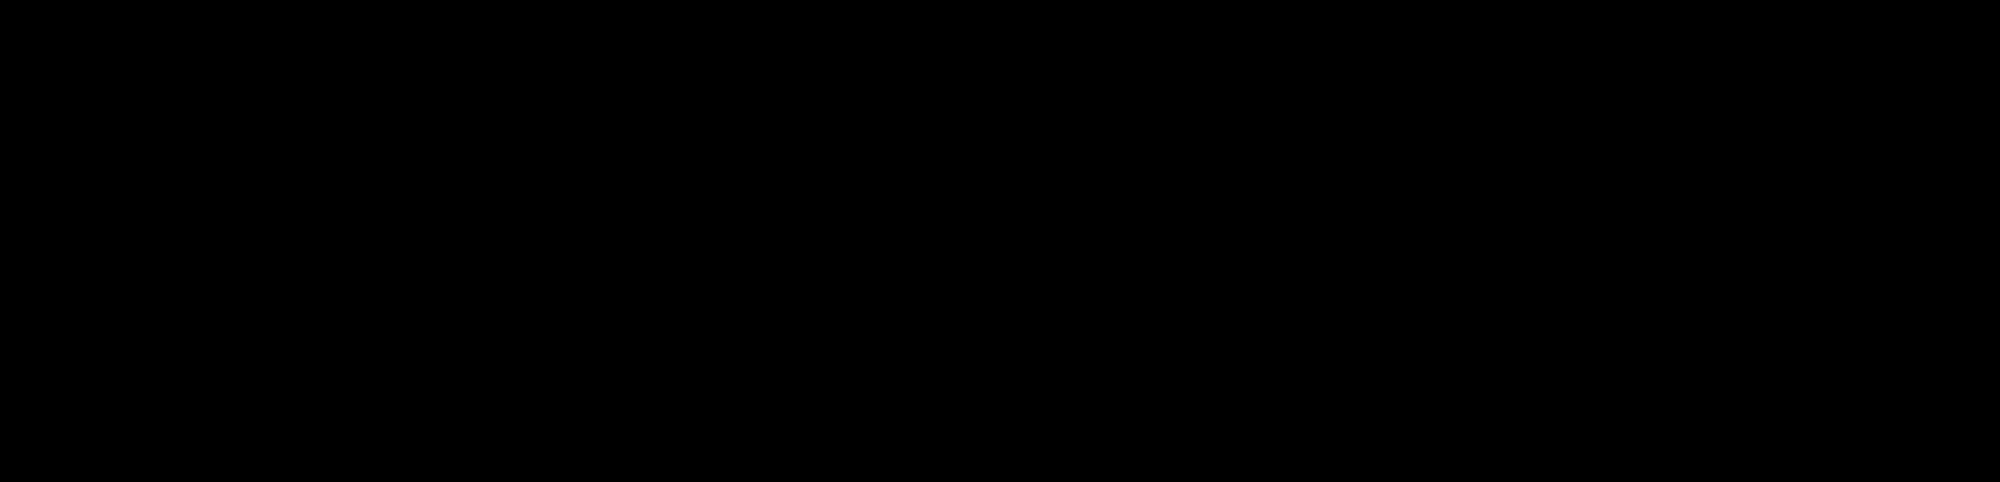 Shalini Mehta Signature